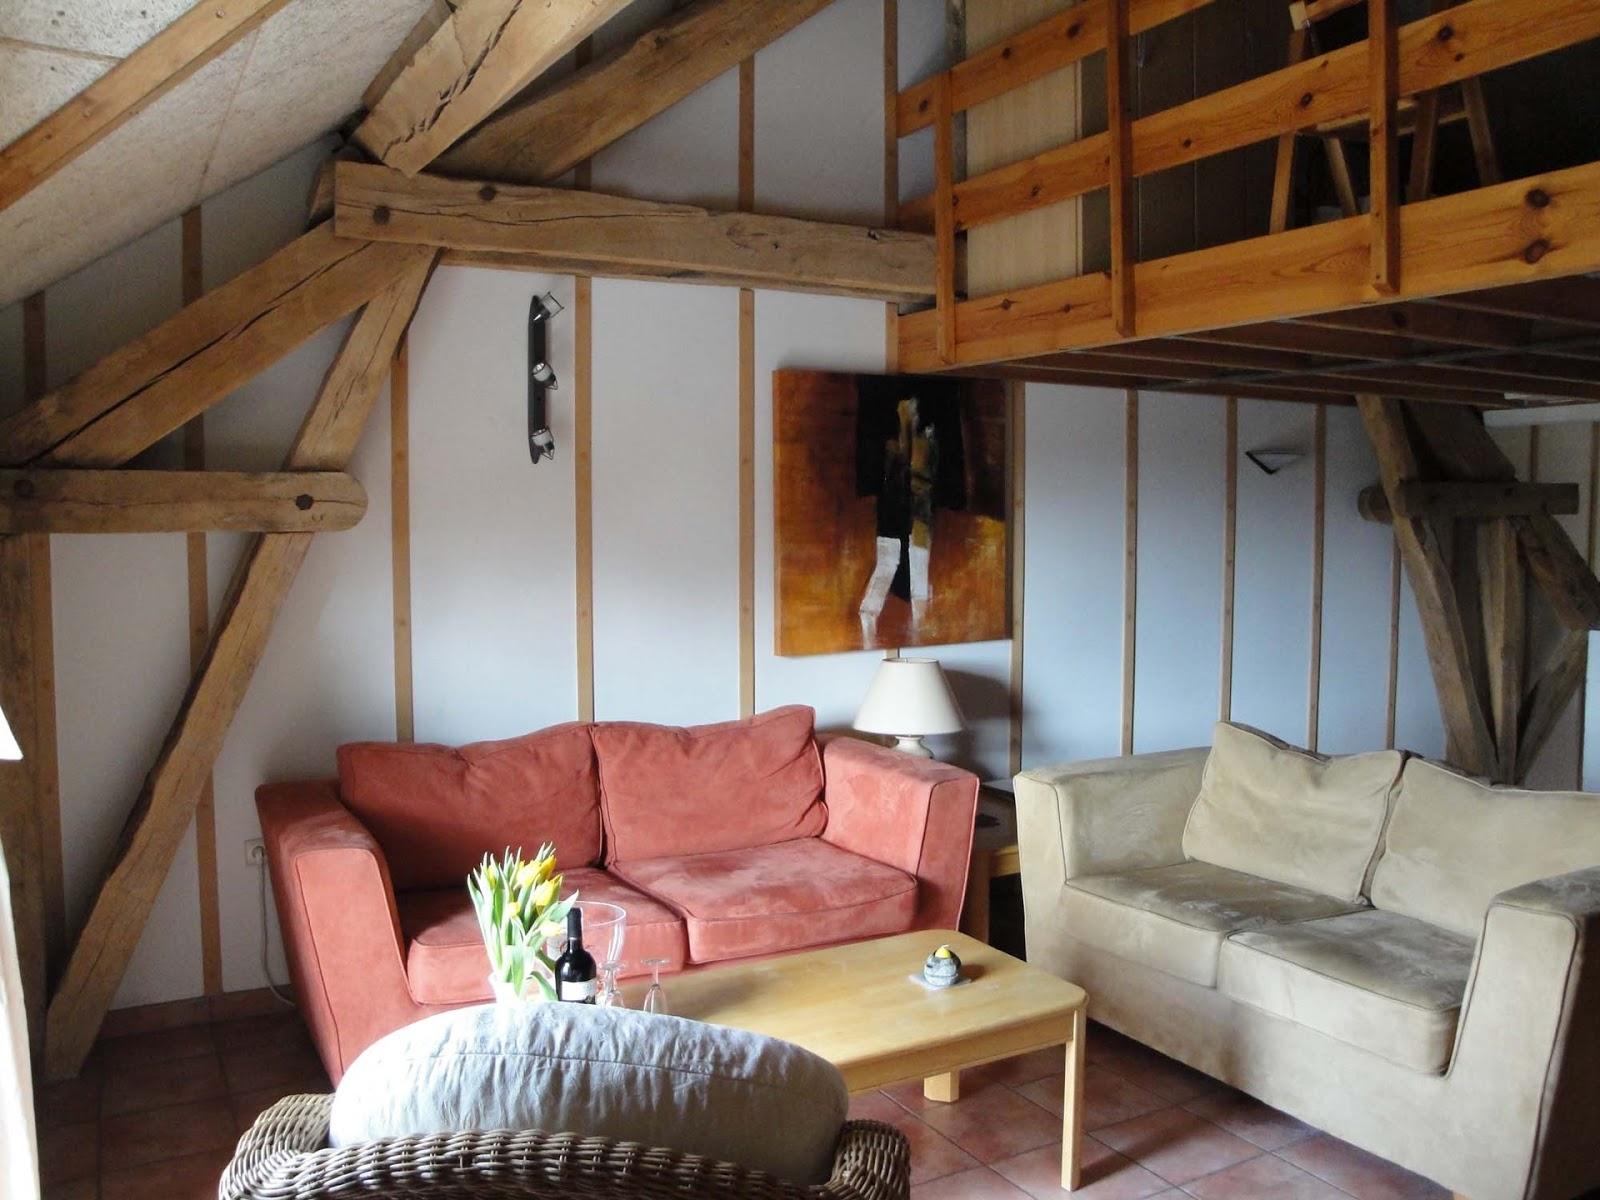 Vakantie-Appartement (A2) 2 kamers (60-72m²) 5 personen